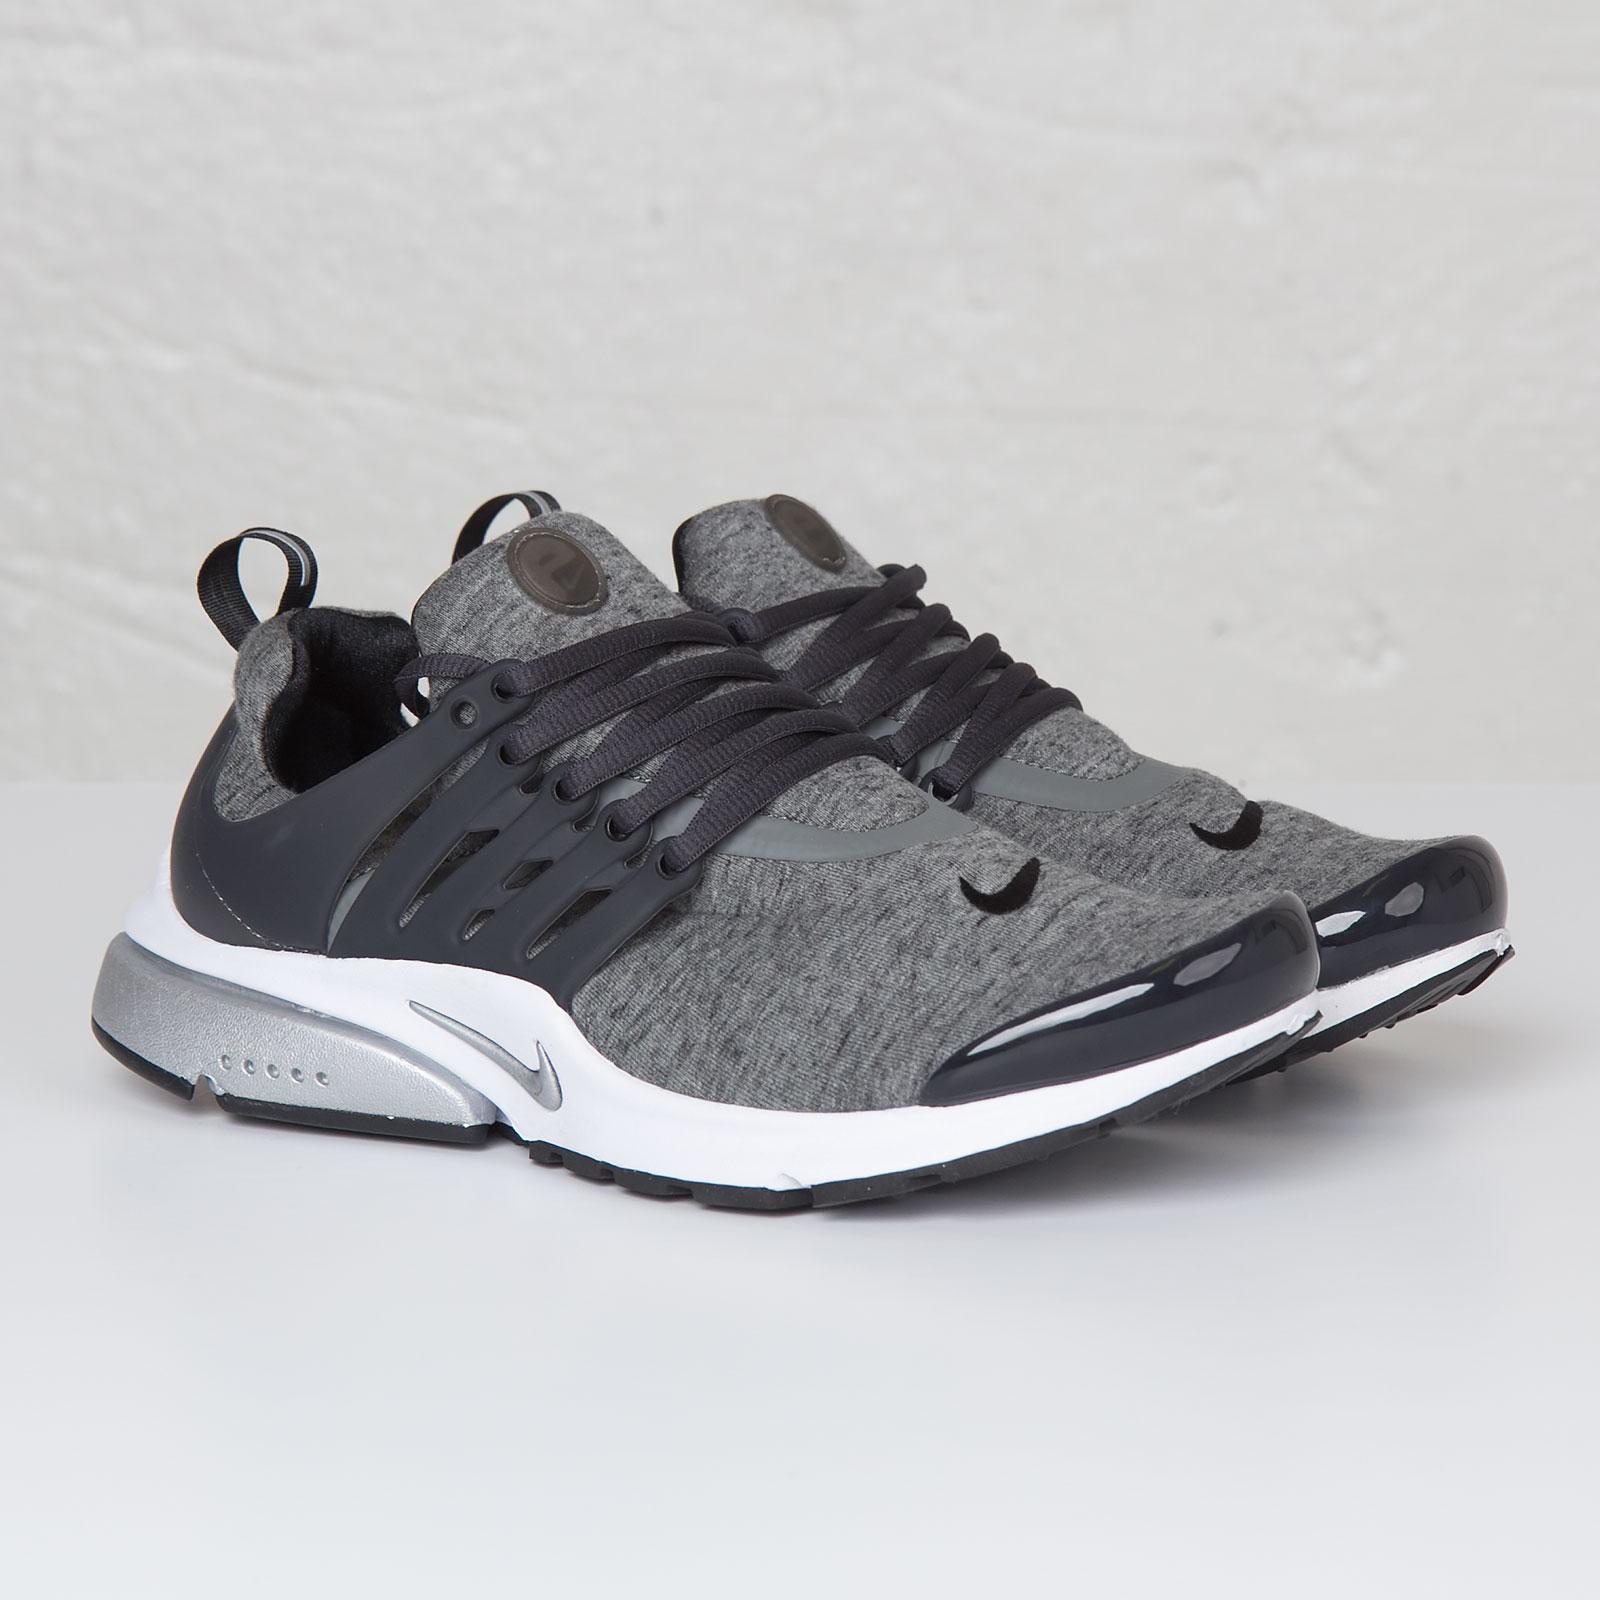 hot sale online 59df6 a3346 Nike Air Presto Fleece